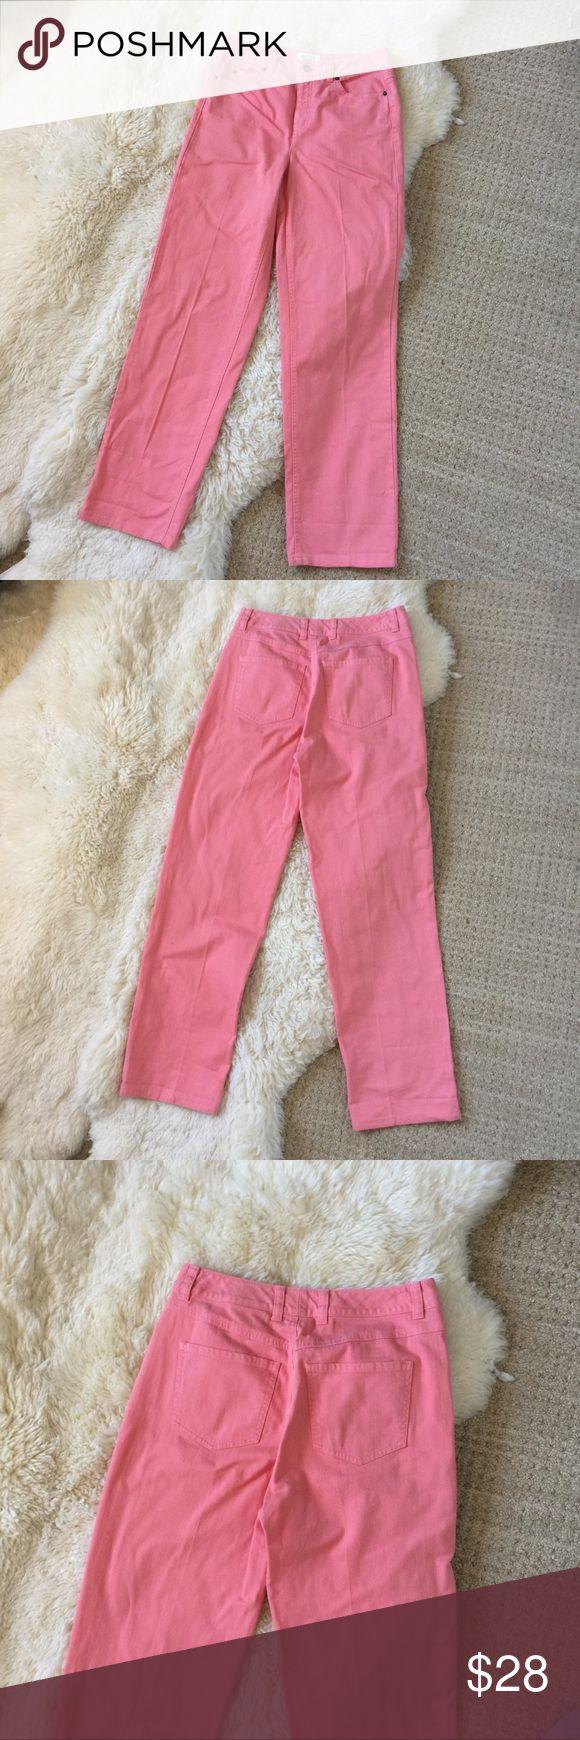 Talbots Coral Skinny Jean Pants Size 4 Talbots Stretch Skinny Pants Jeans. Coral. Cotton Spandex blend. Machine wash. Size 4. Talbots Pants